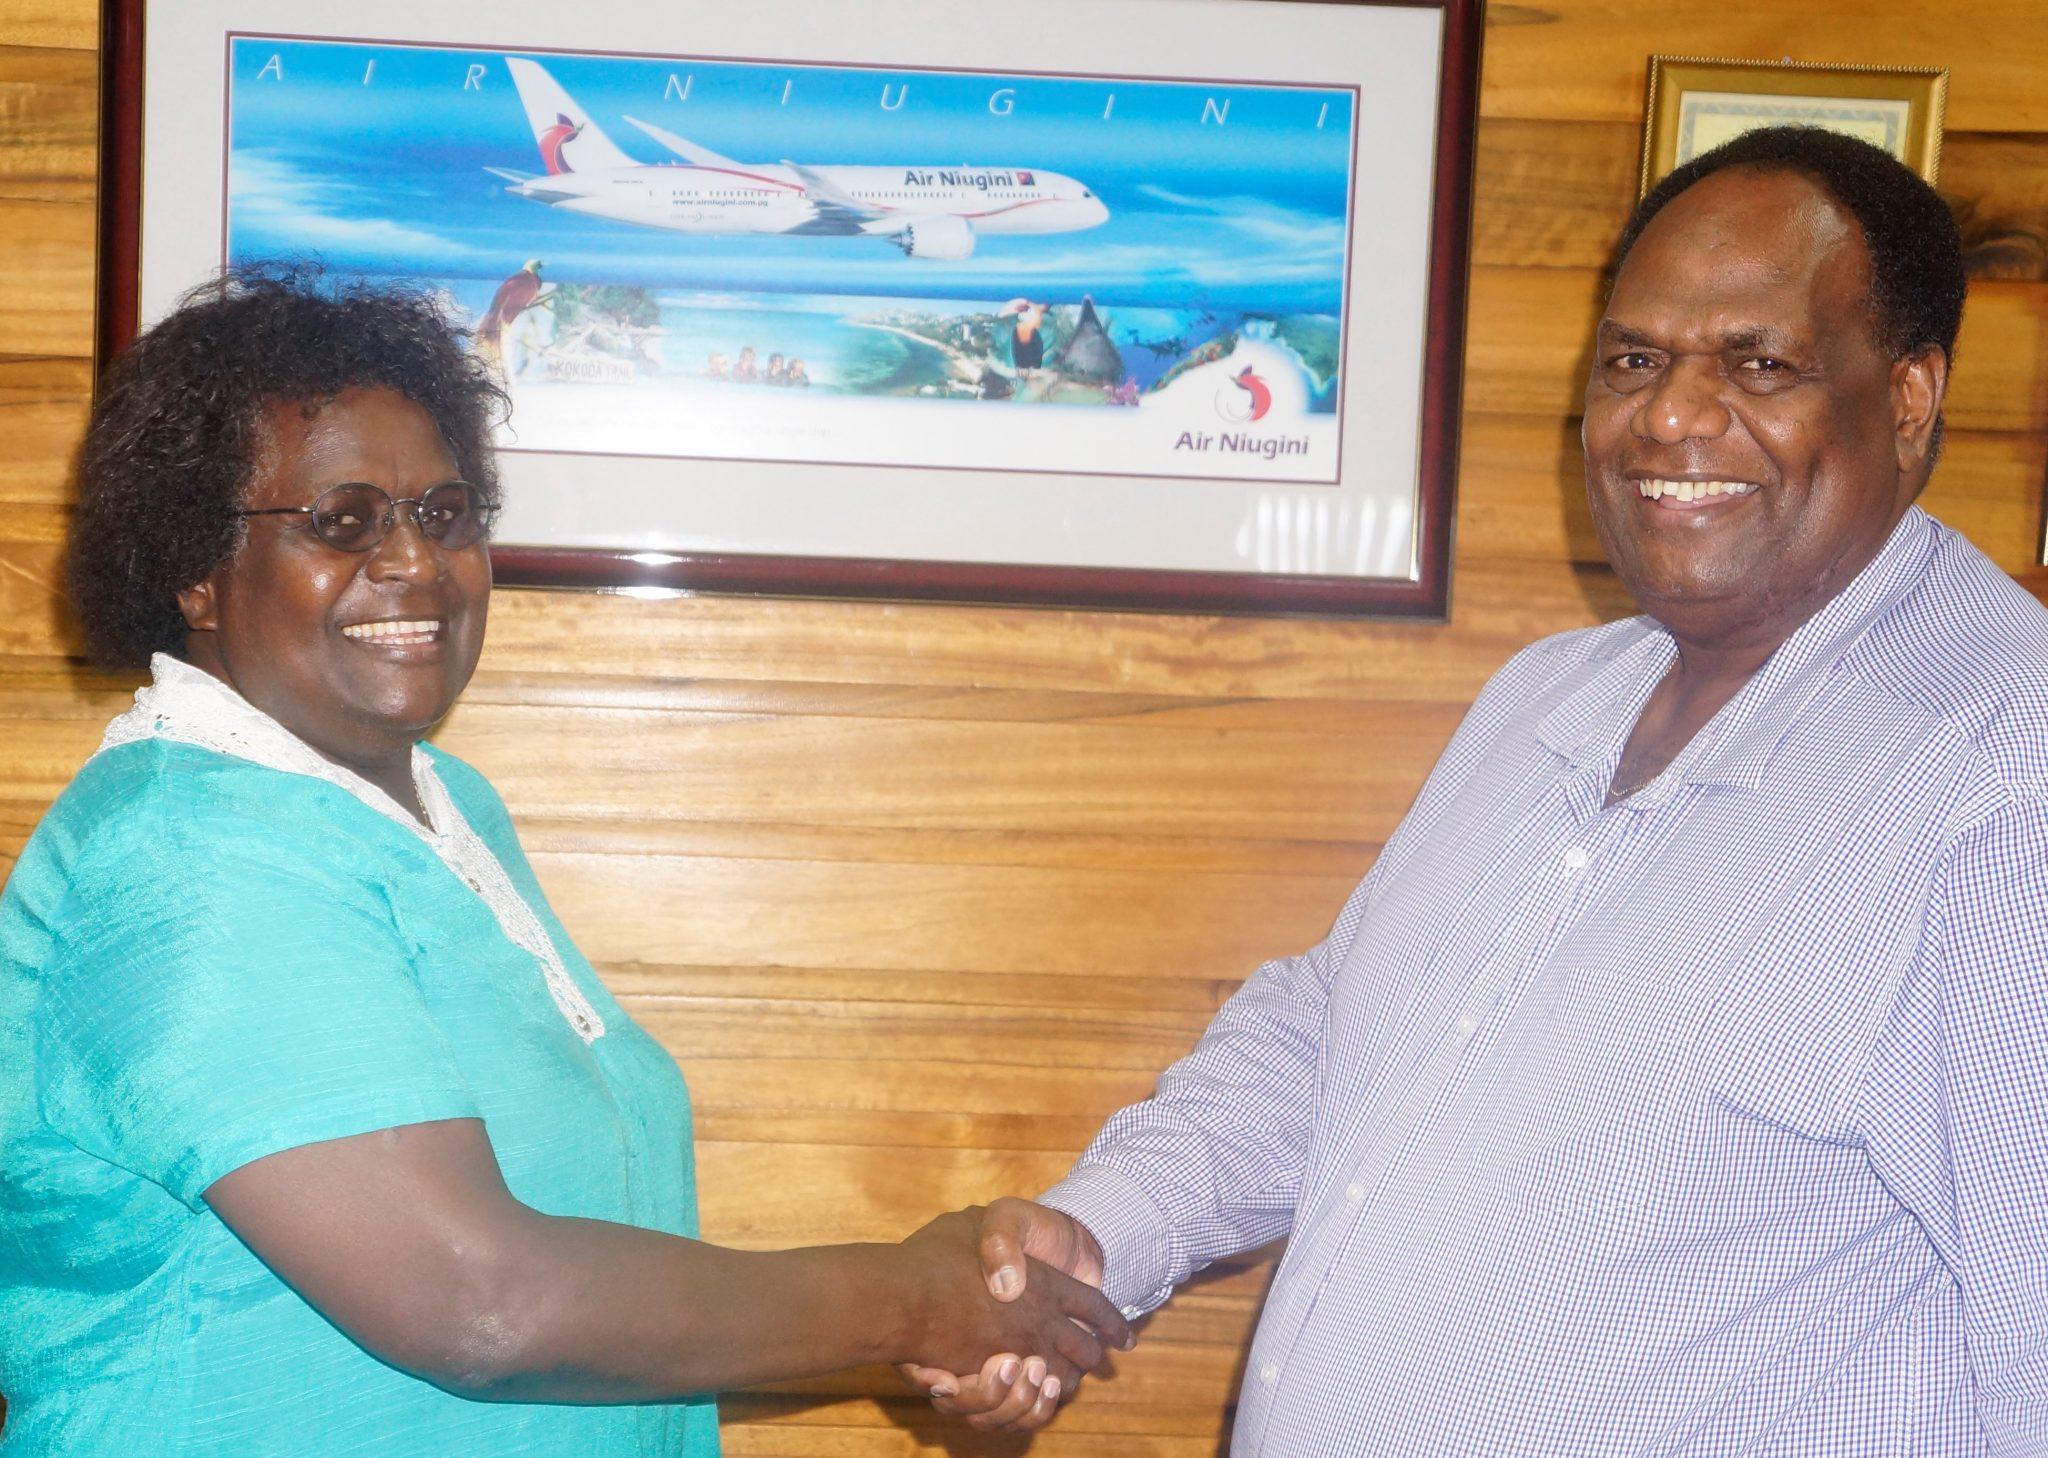 Kilo appointed to head Air Niugini Honiara Office